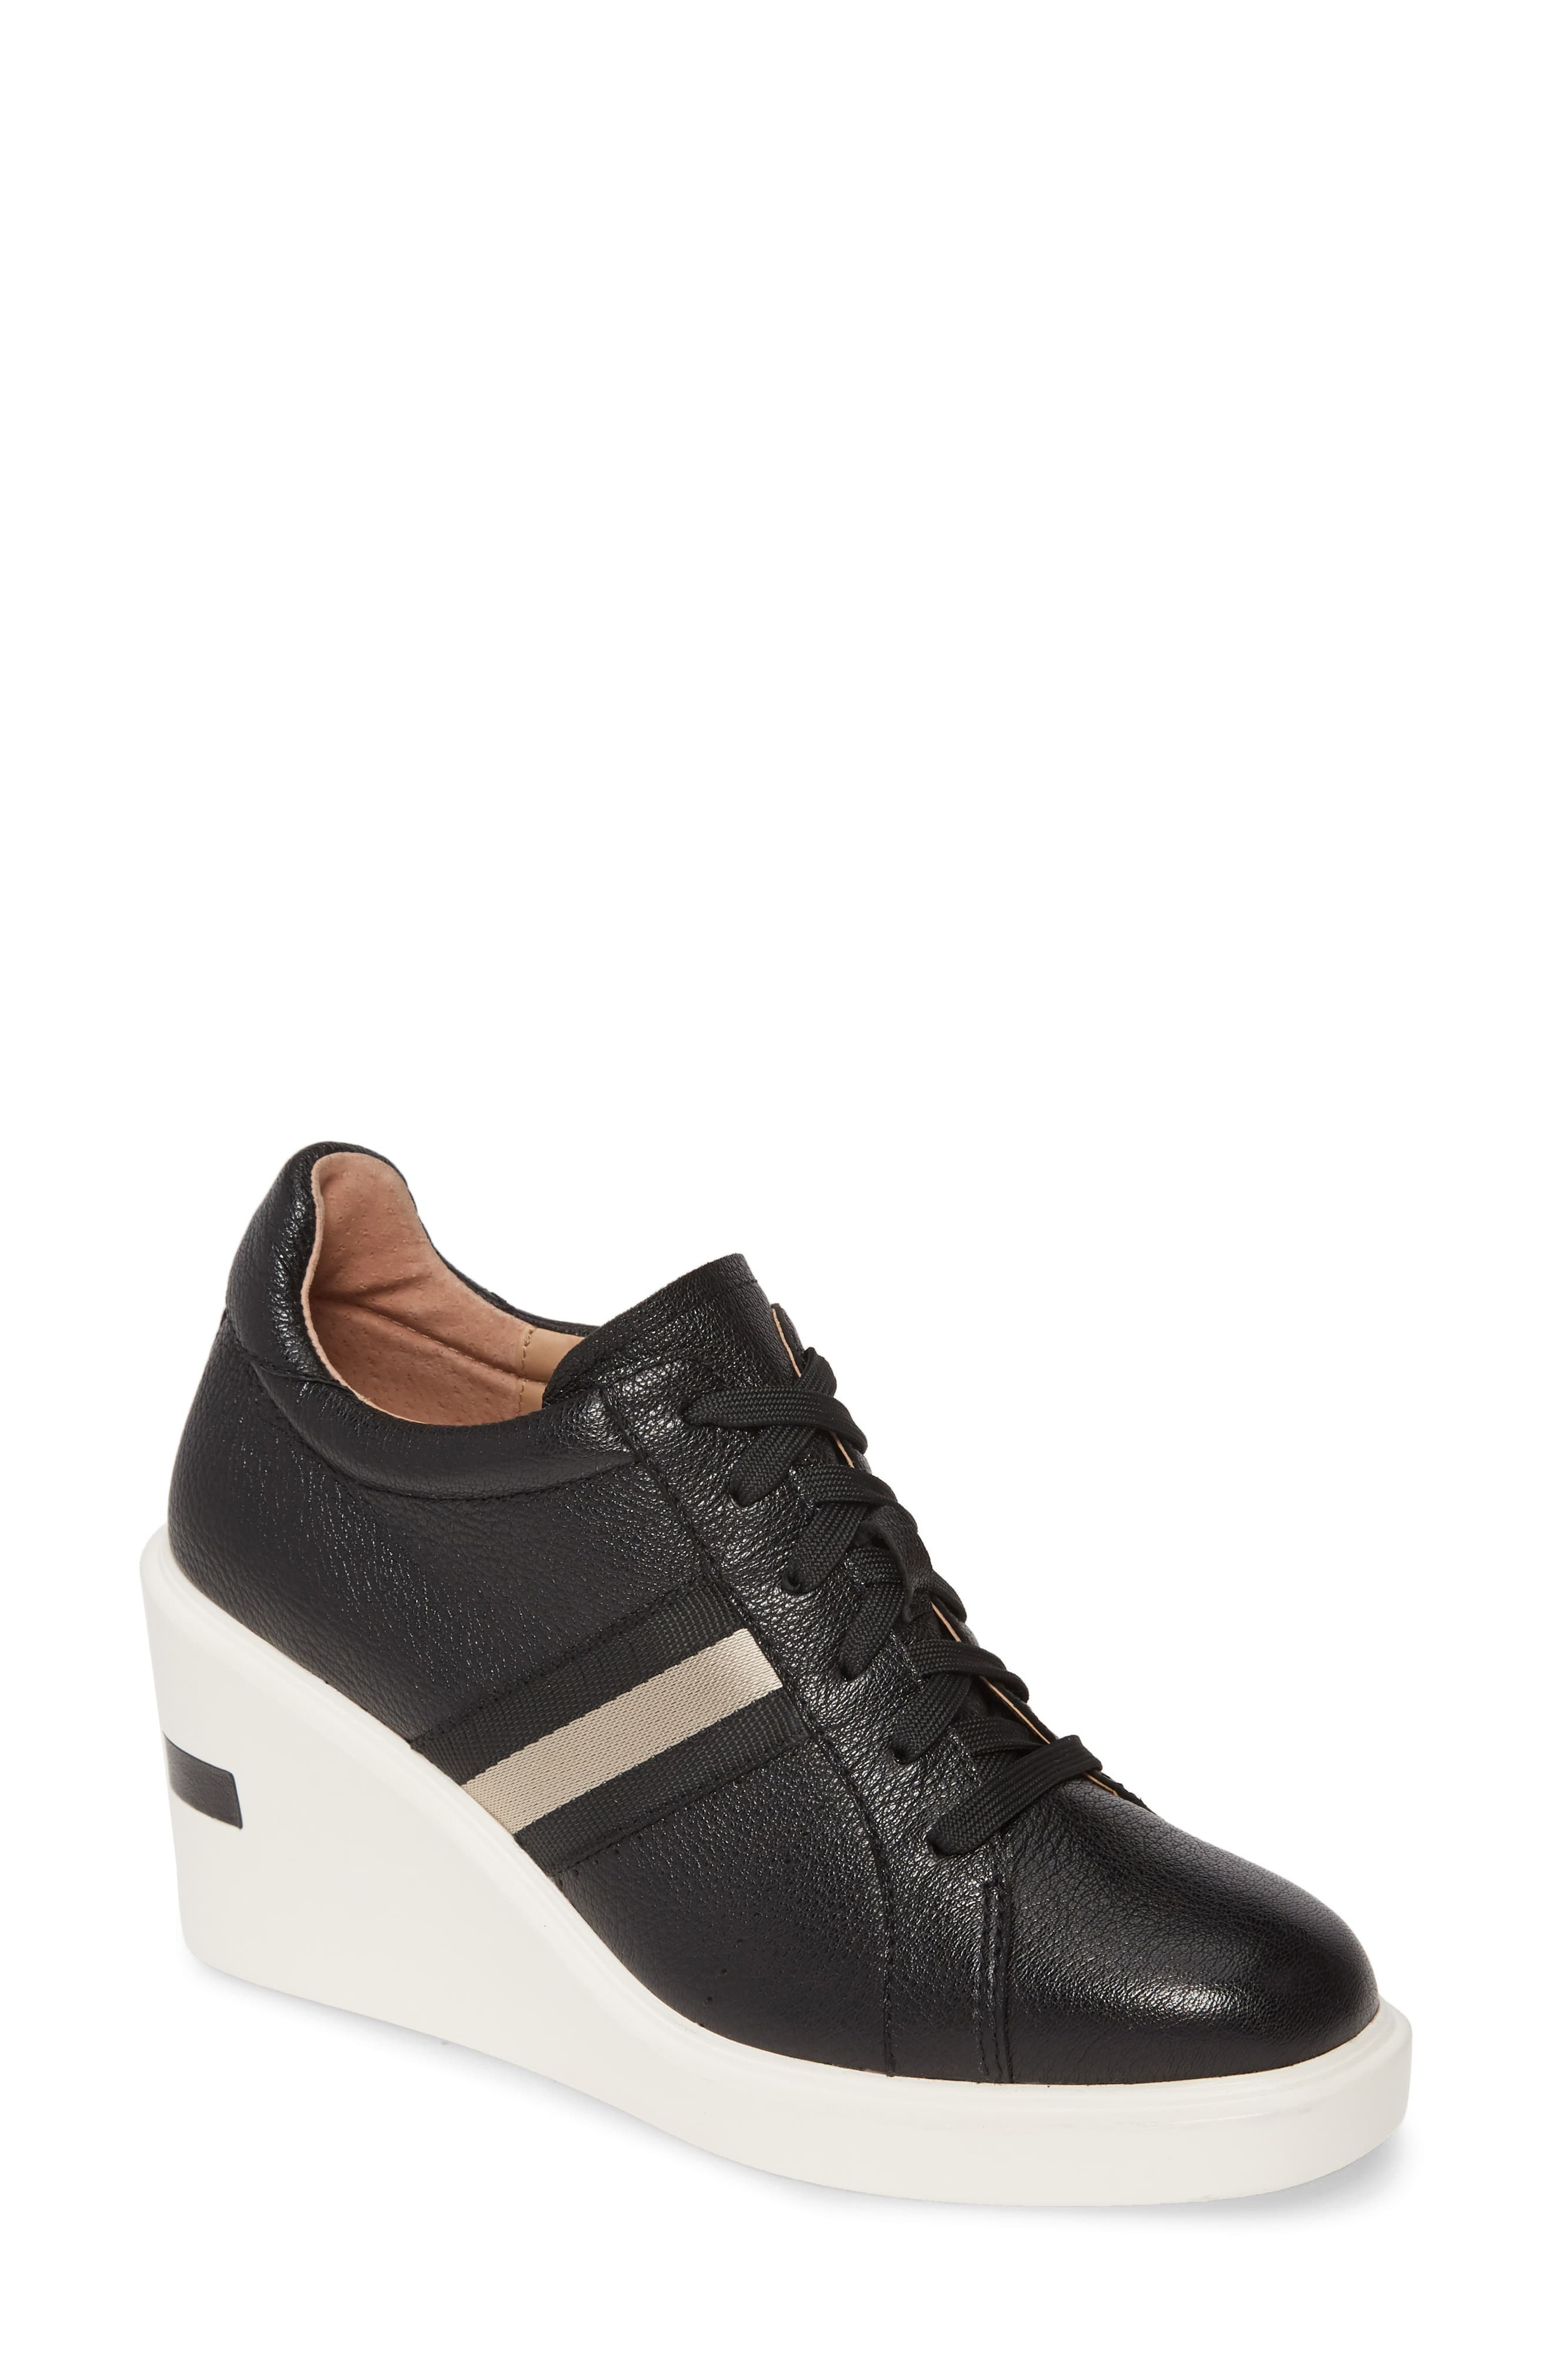 Linea Paolo Kandis Wedge Sneaker, $129